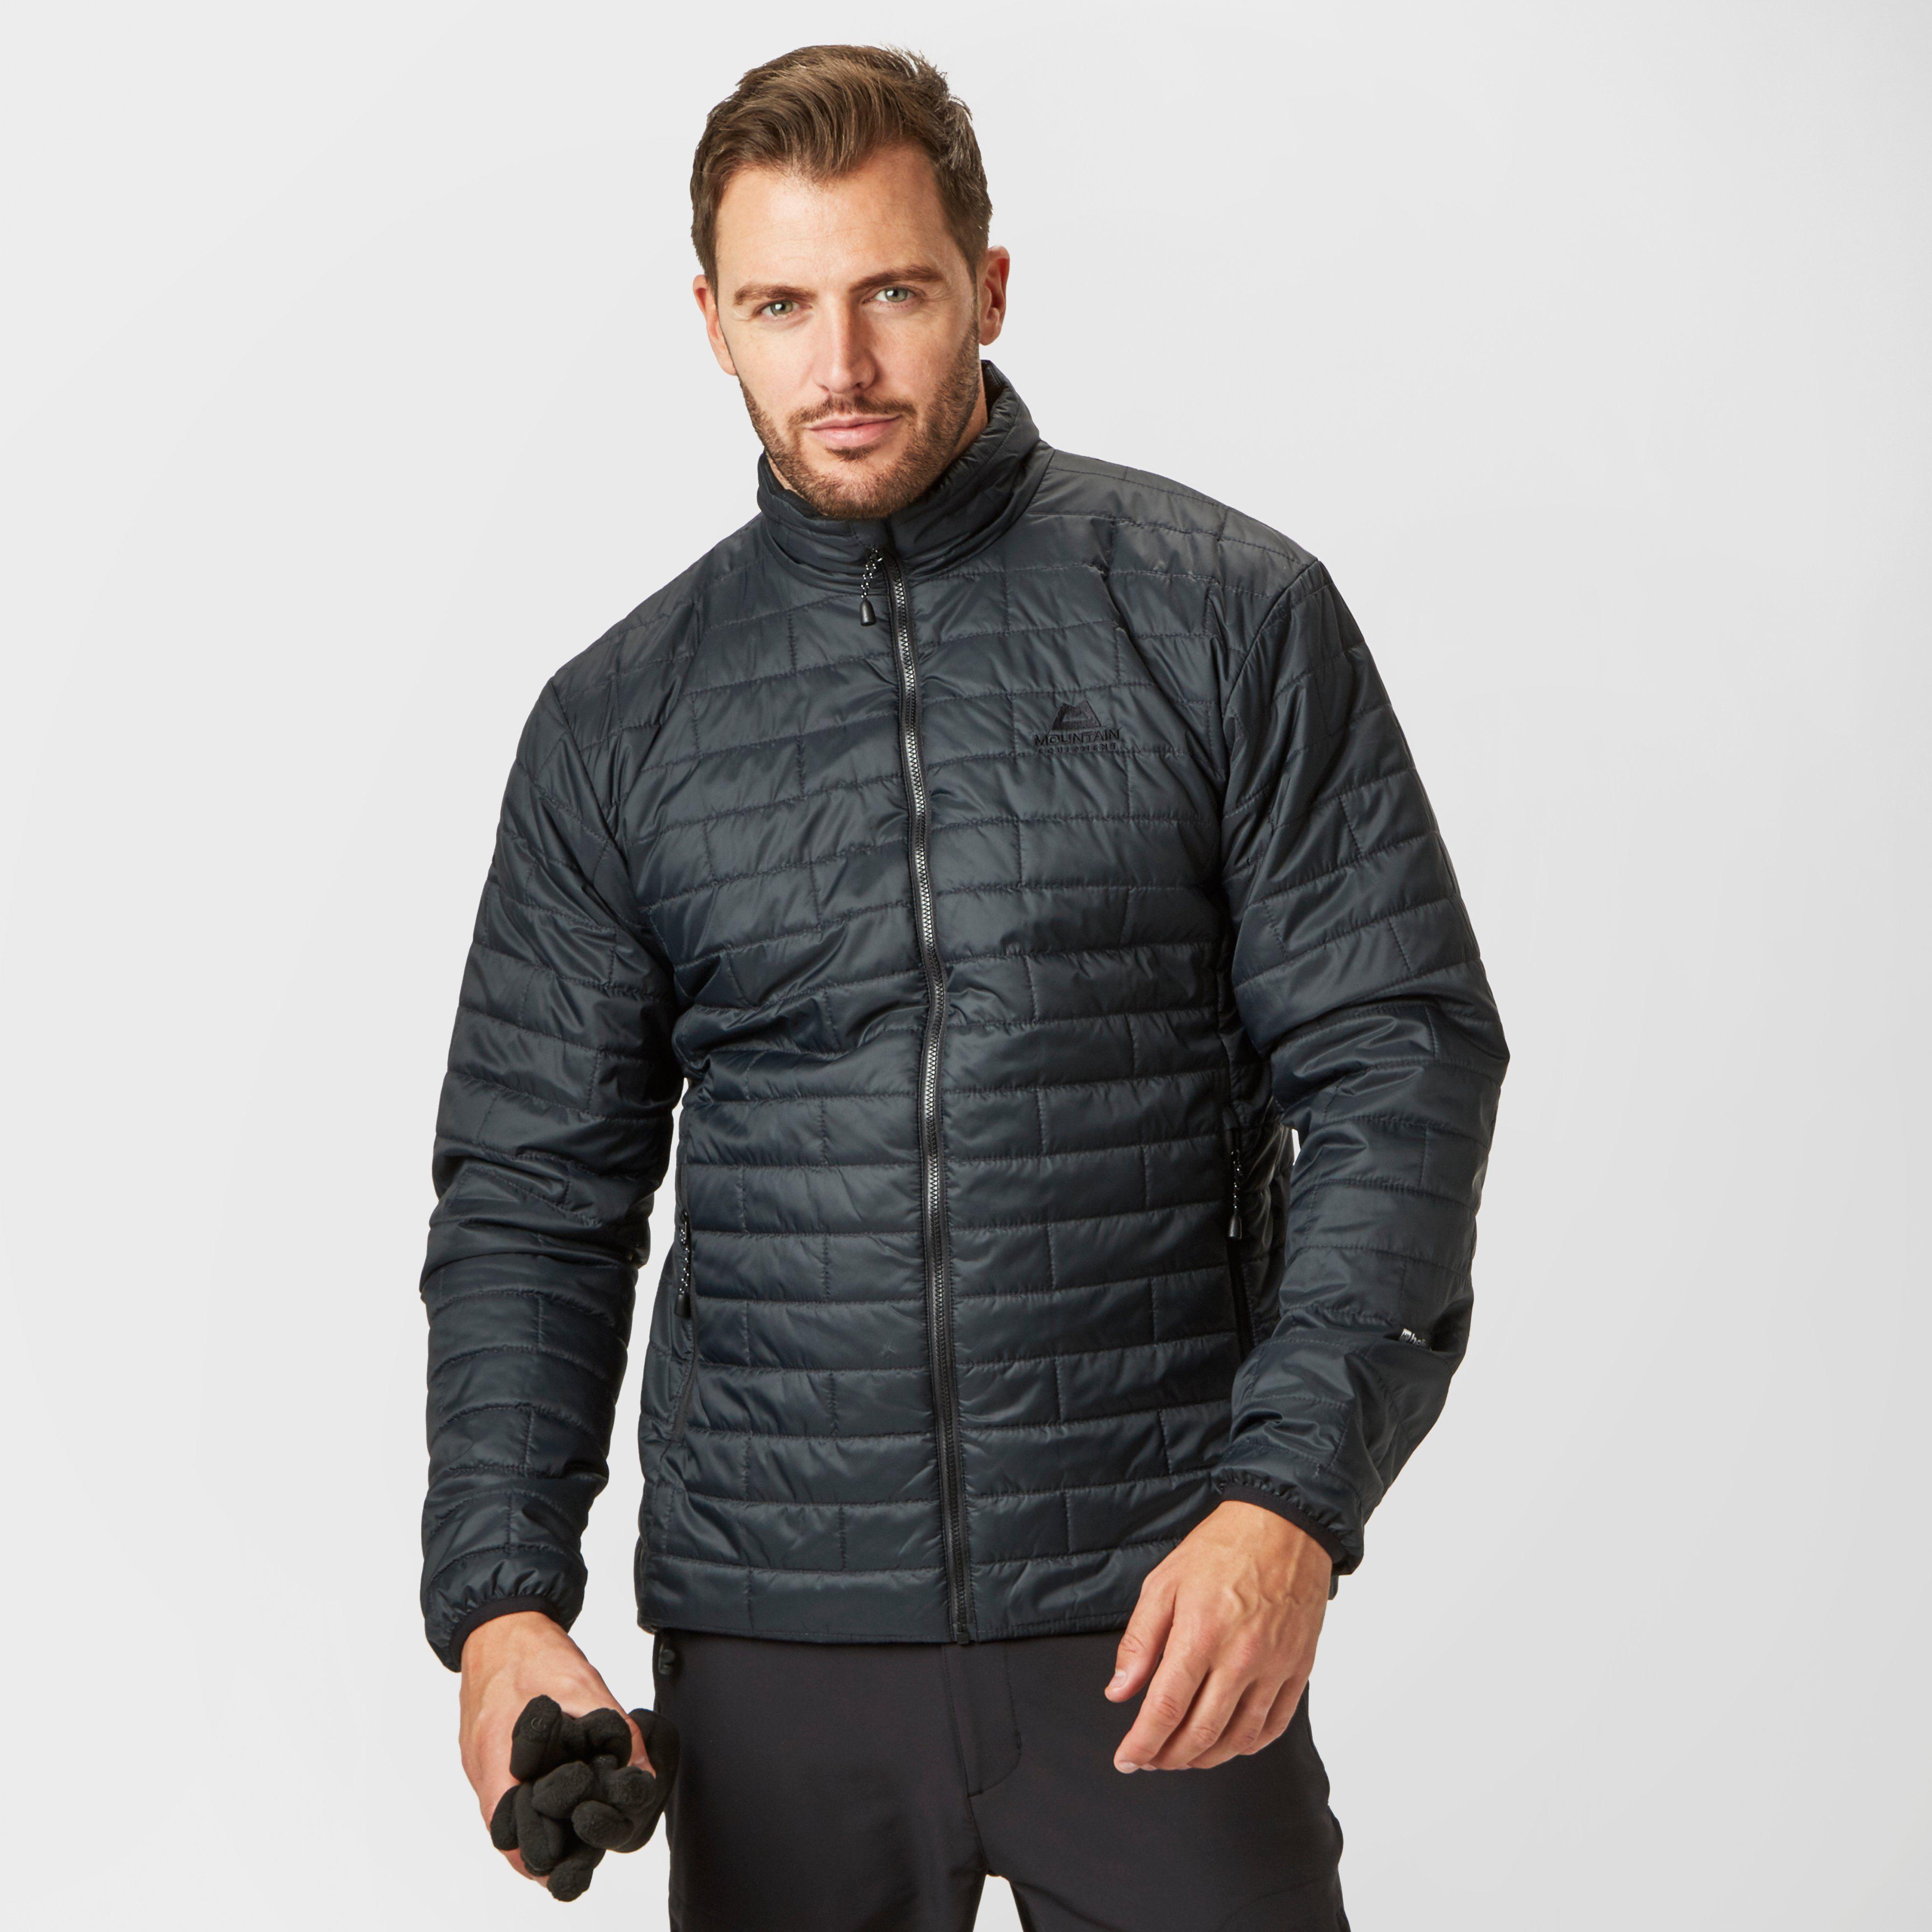 MOUNTAIN EQUIPMENT Men's Rampart Insulated Jacket